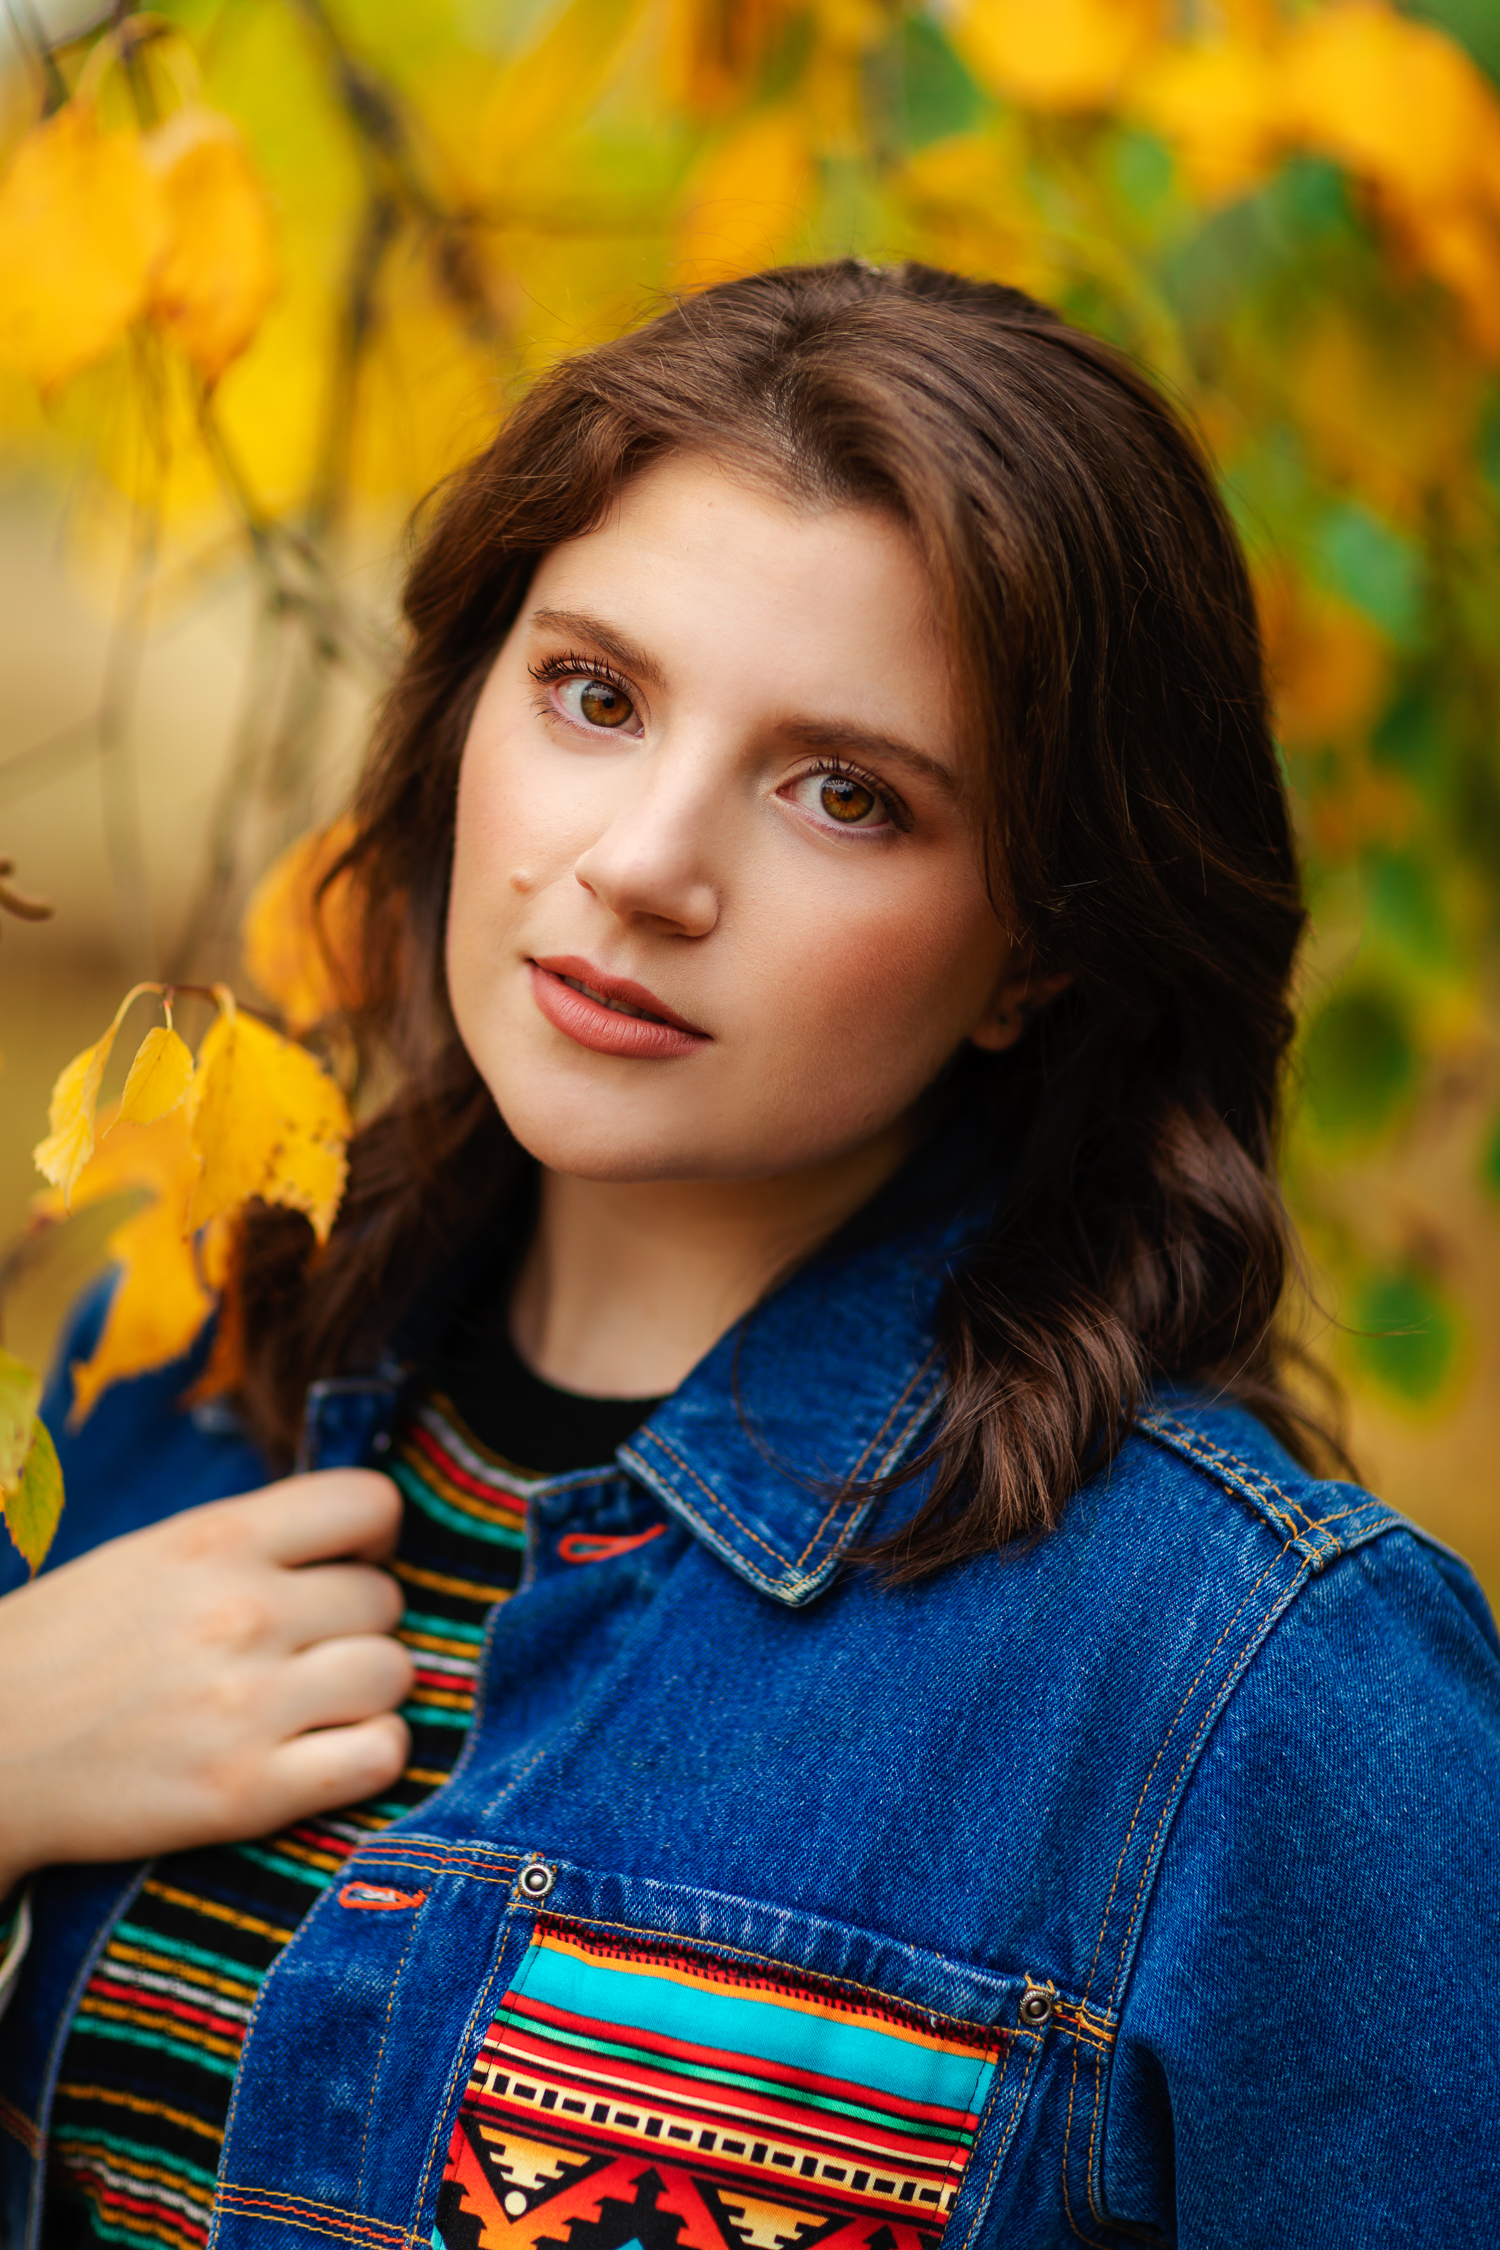 ariellanoellephotography-overlake-high-school-senior-portraits-top-seattle-area-highschool-senior-photographer-1-8.jpg